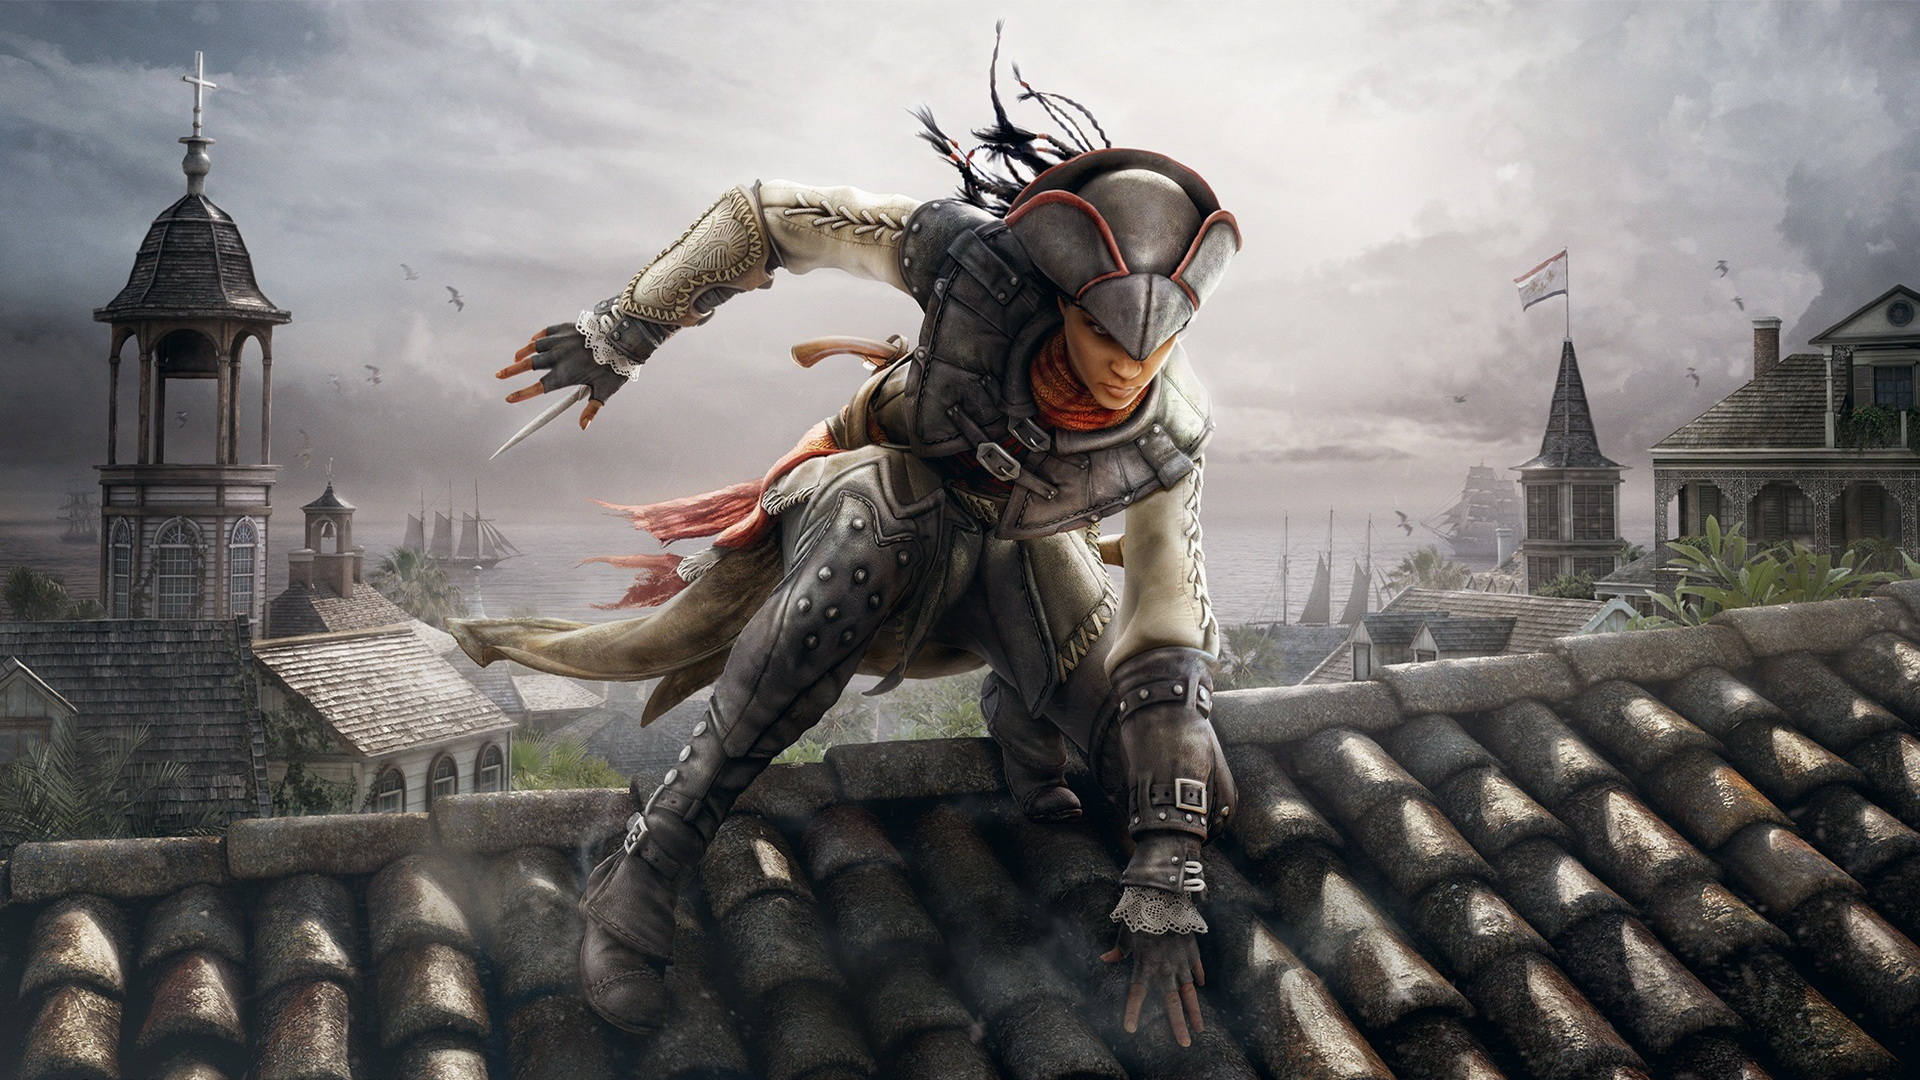 Assassins Creed 3 Liberation Wallpapers Wallpapers Hd